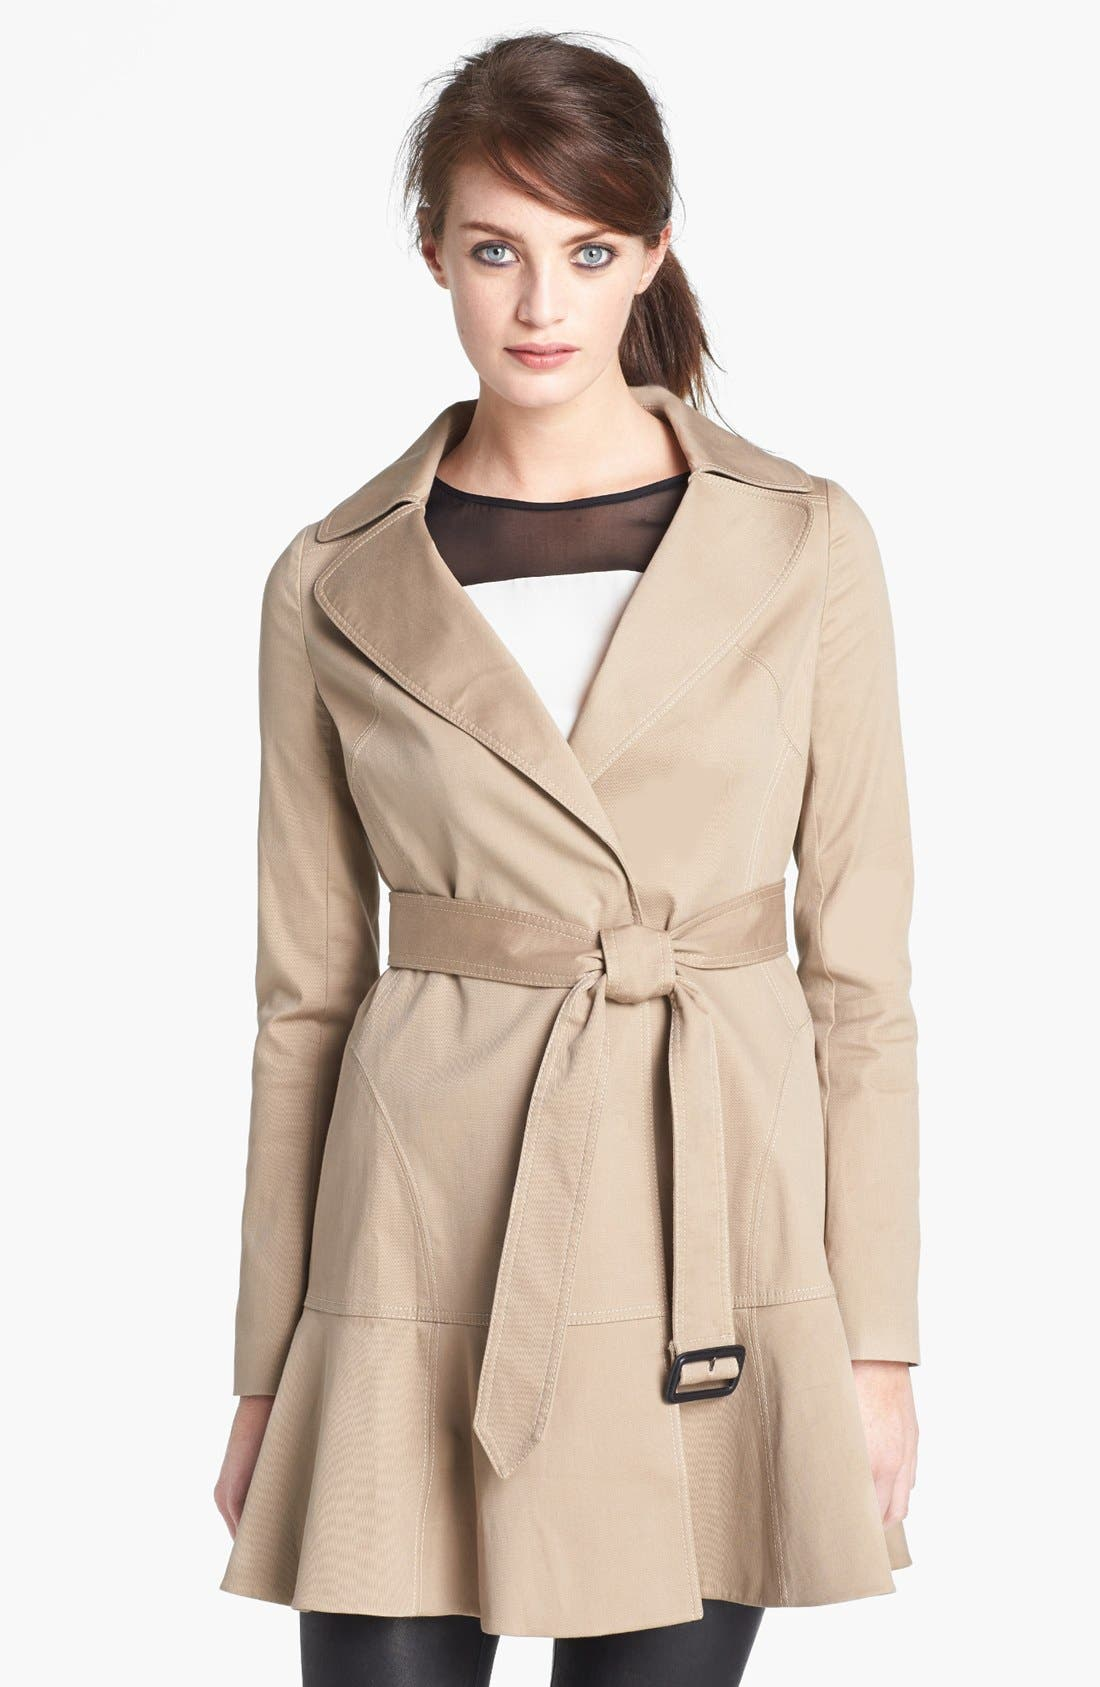 Main Image - Diane von Furstenberg 'Kadence' Cotton Blend Trench Coat